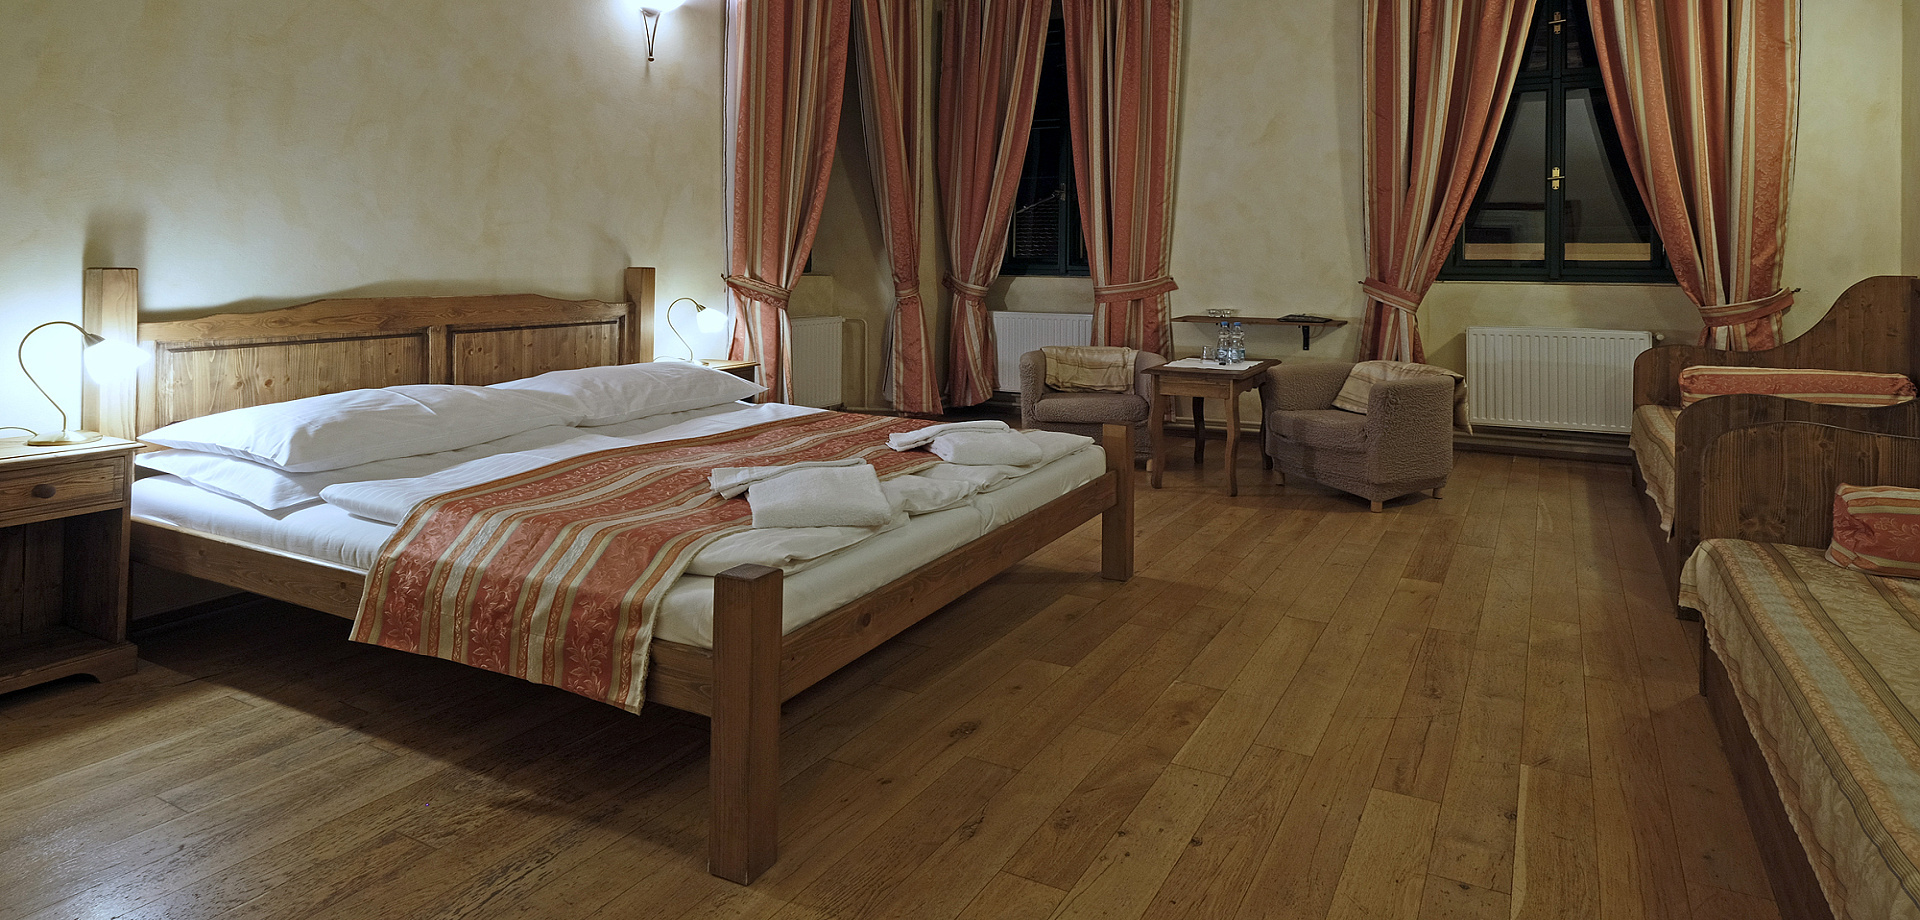 Hotel Opat (08)